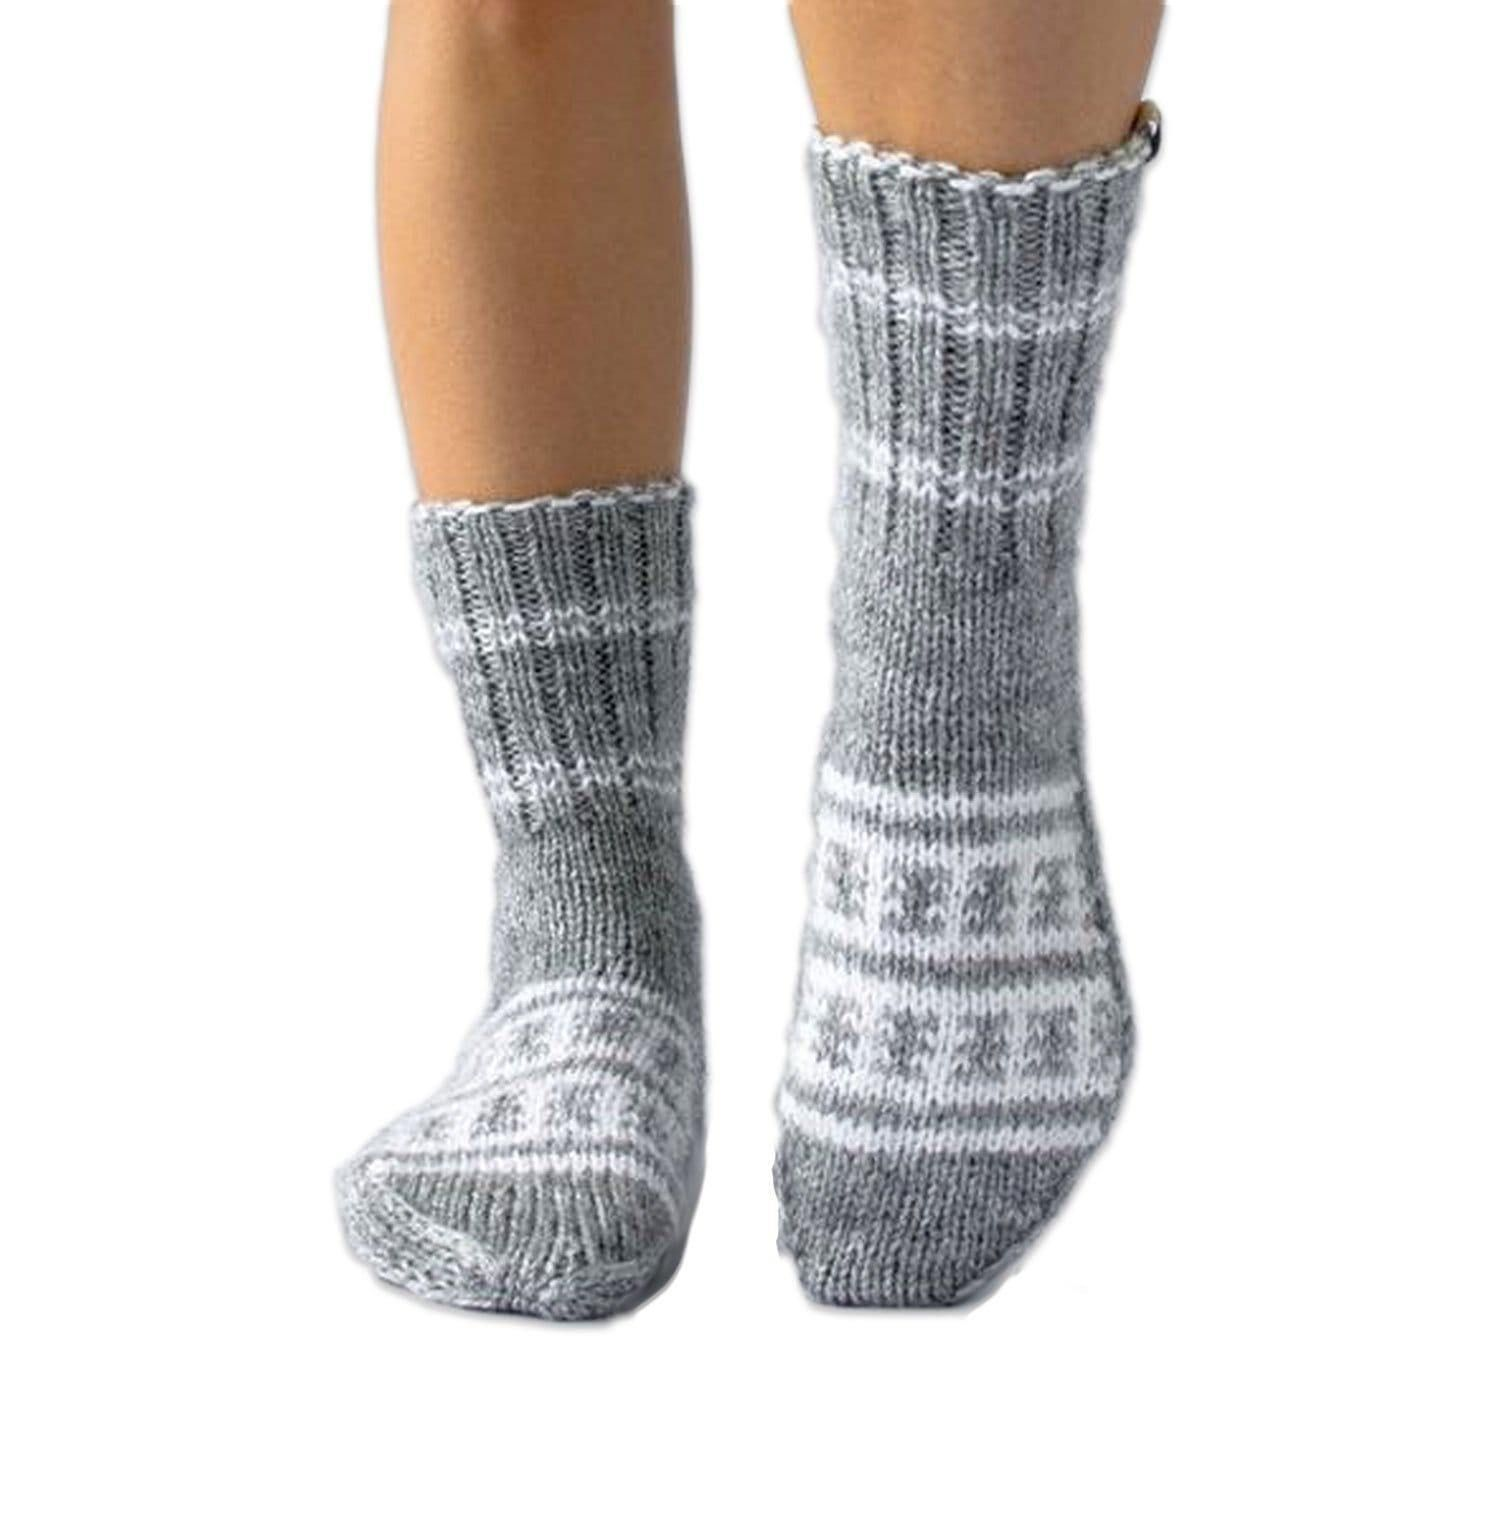 Shanti (Peace) Socks - Adult Extra Small (8)